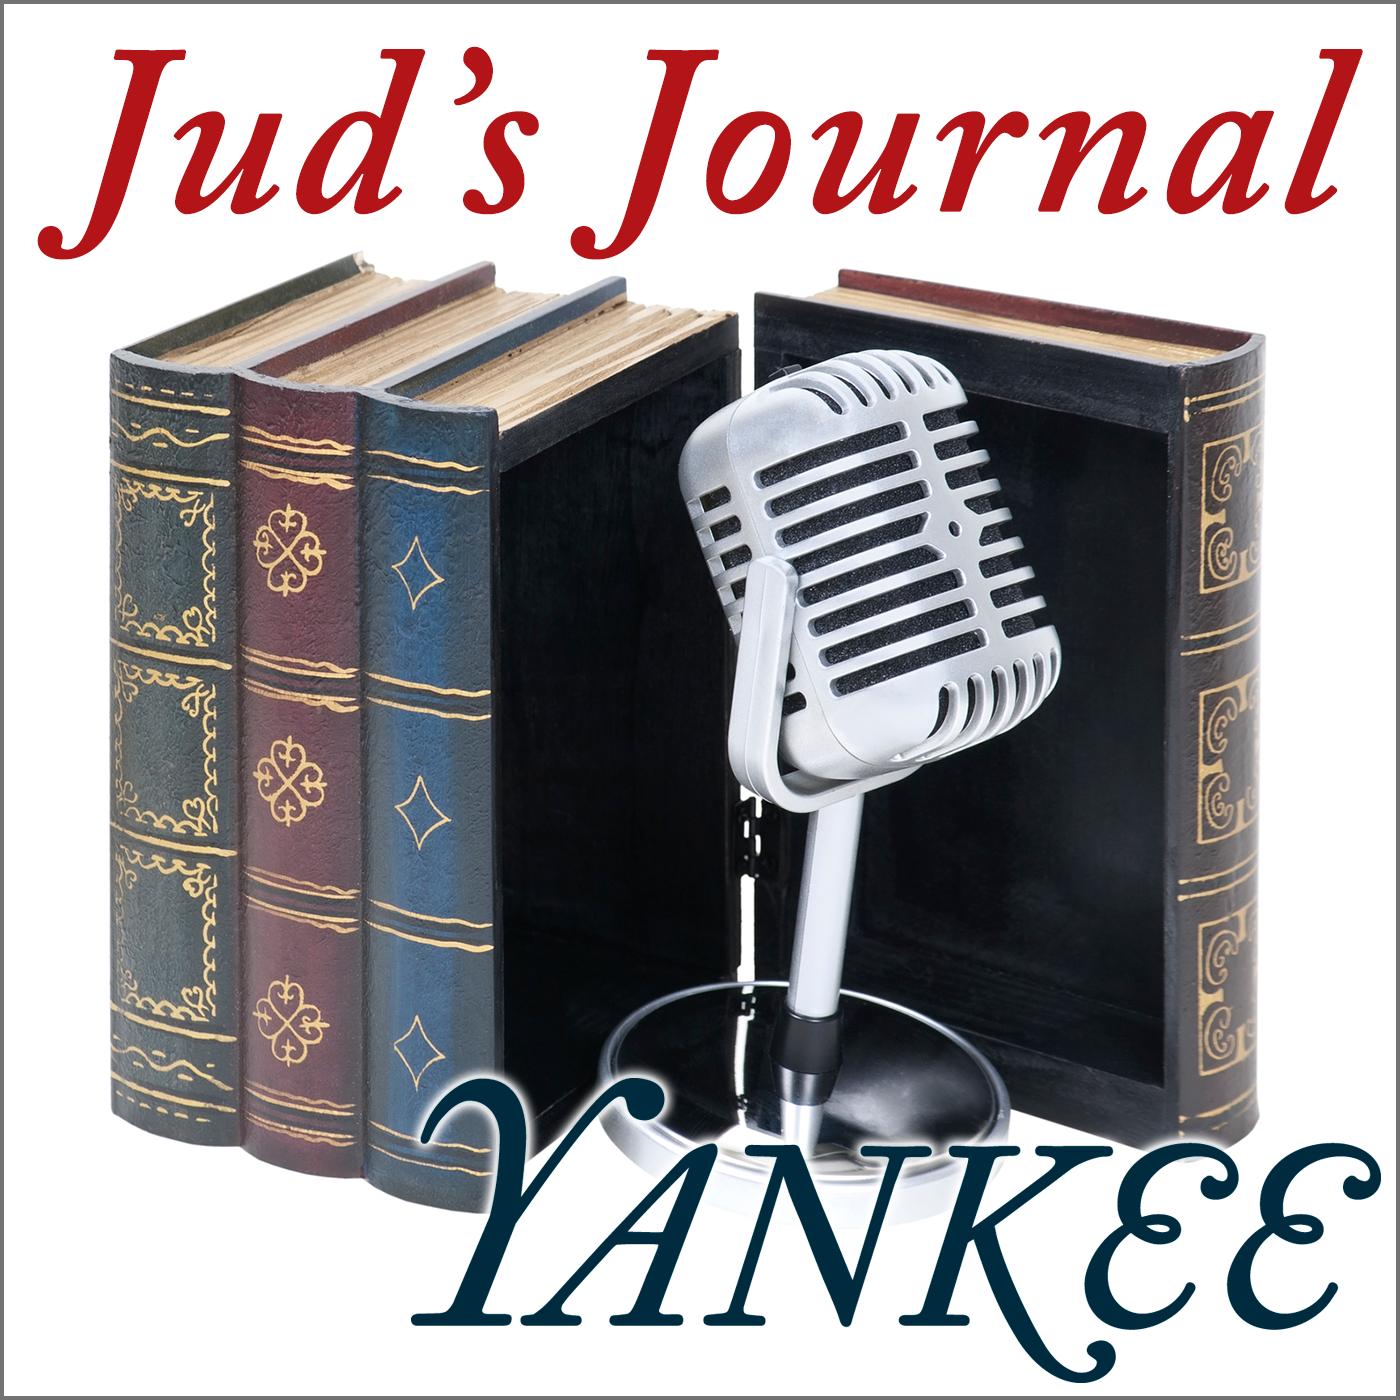 Yankee Magazine » Juds Journal